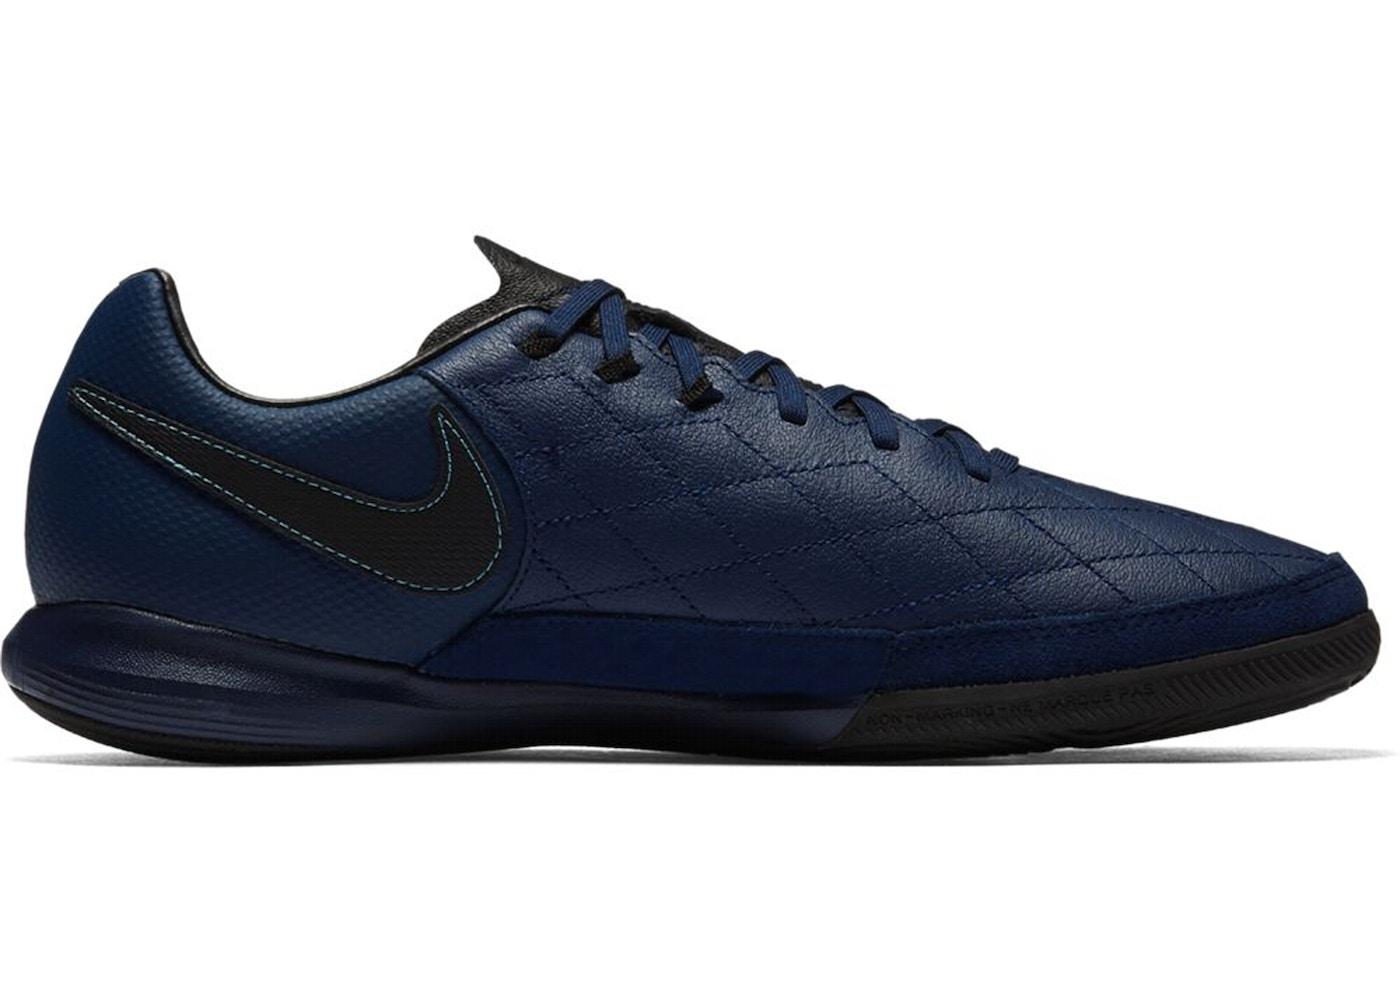 a967c3b02 Nike Tiempo X Finale Indoor 10R Ronaldinho (Flat Sole) - AQ2201-440